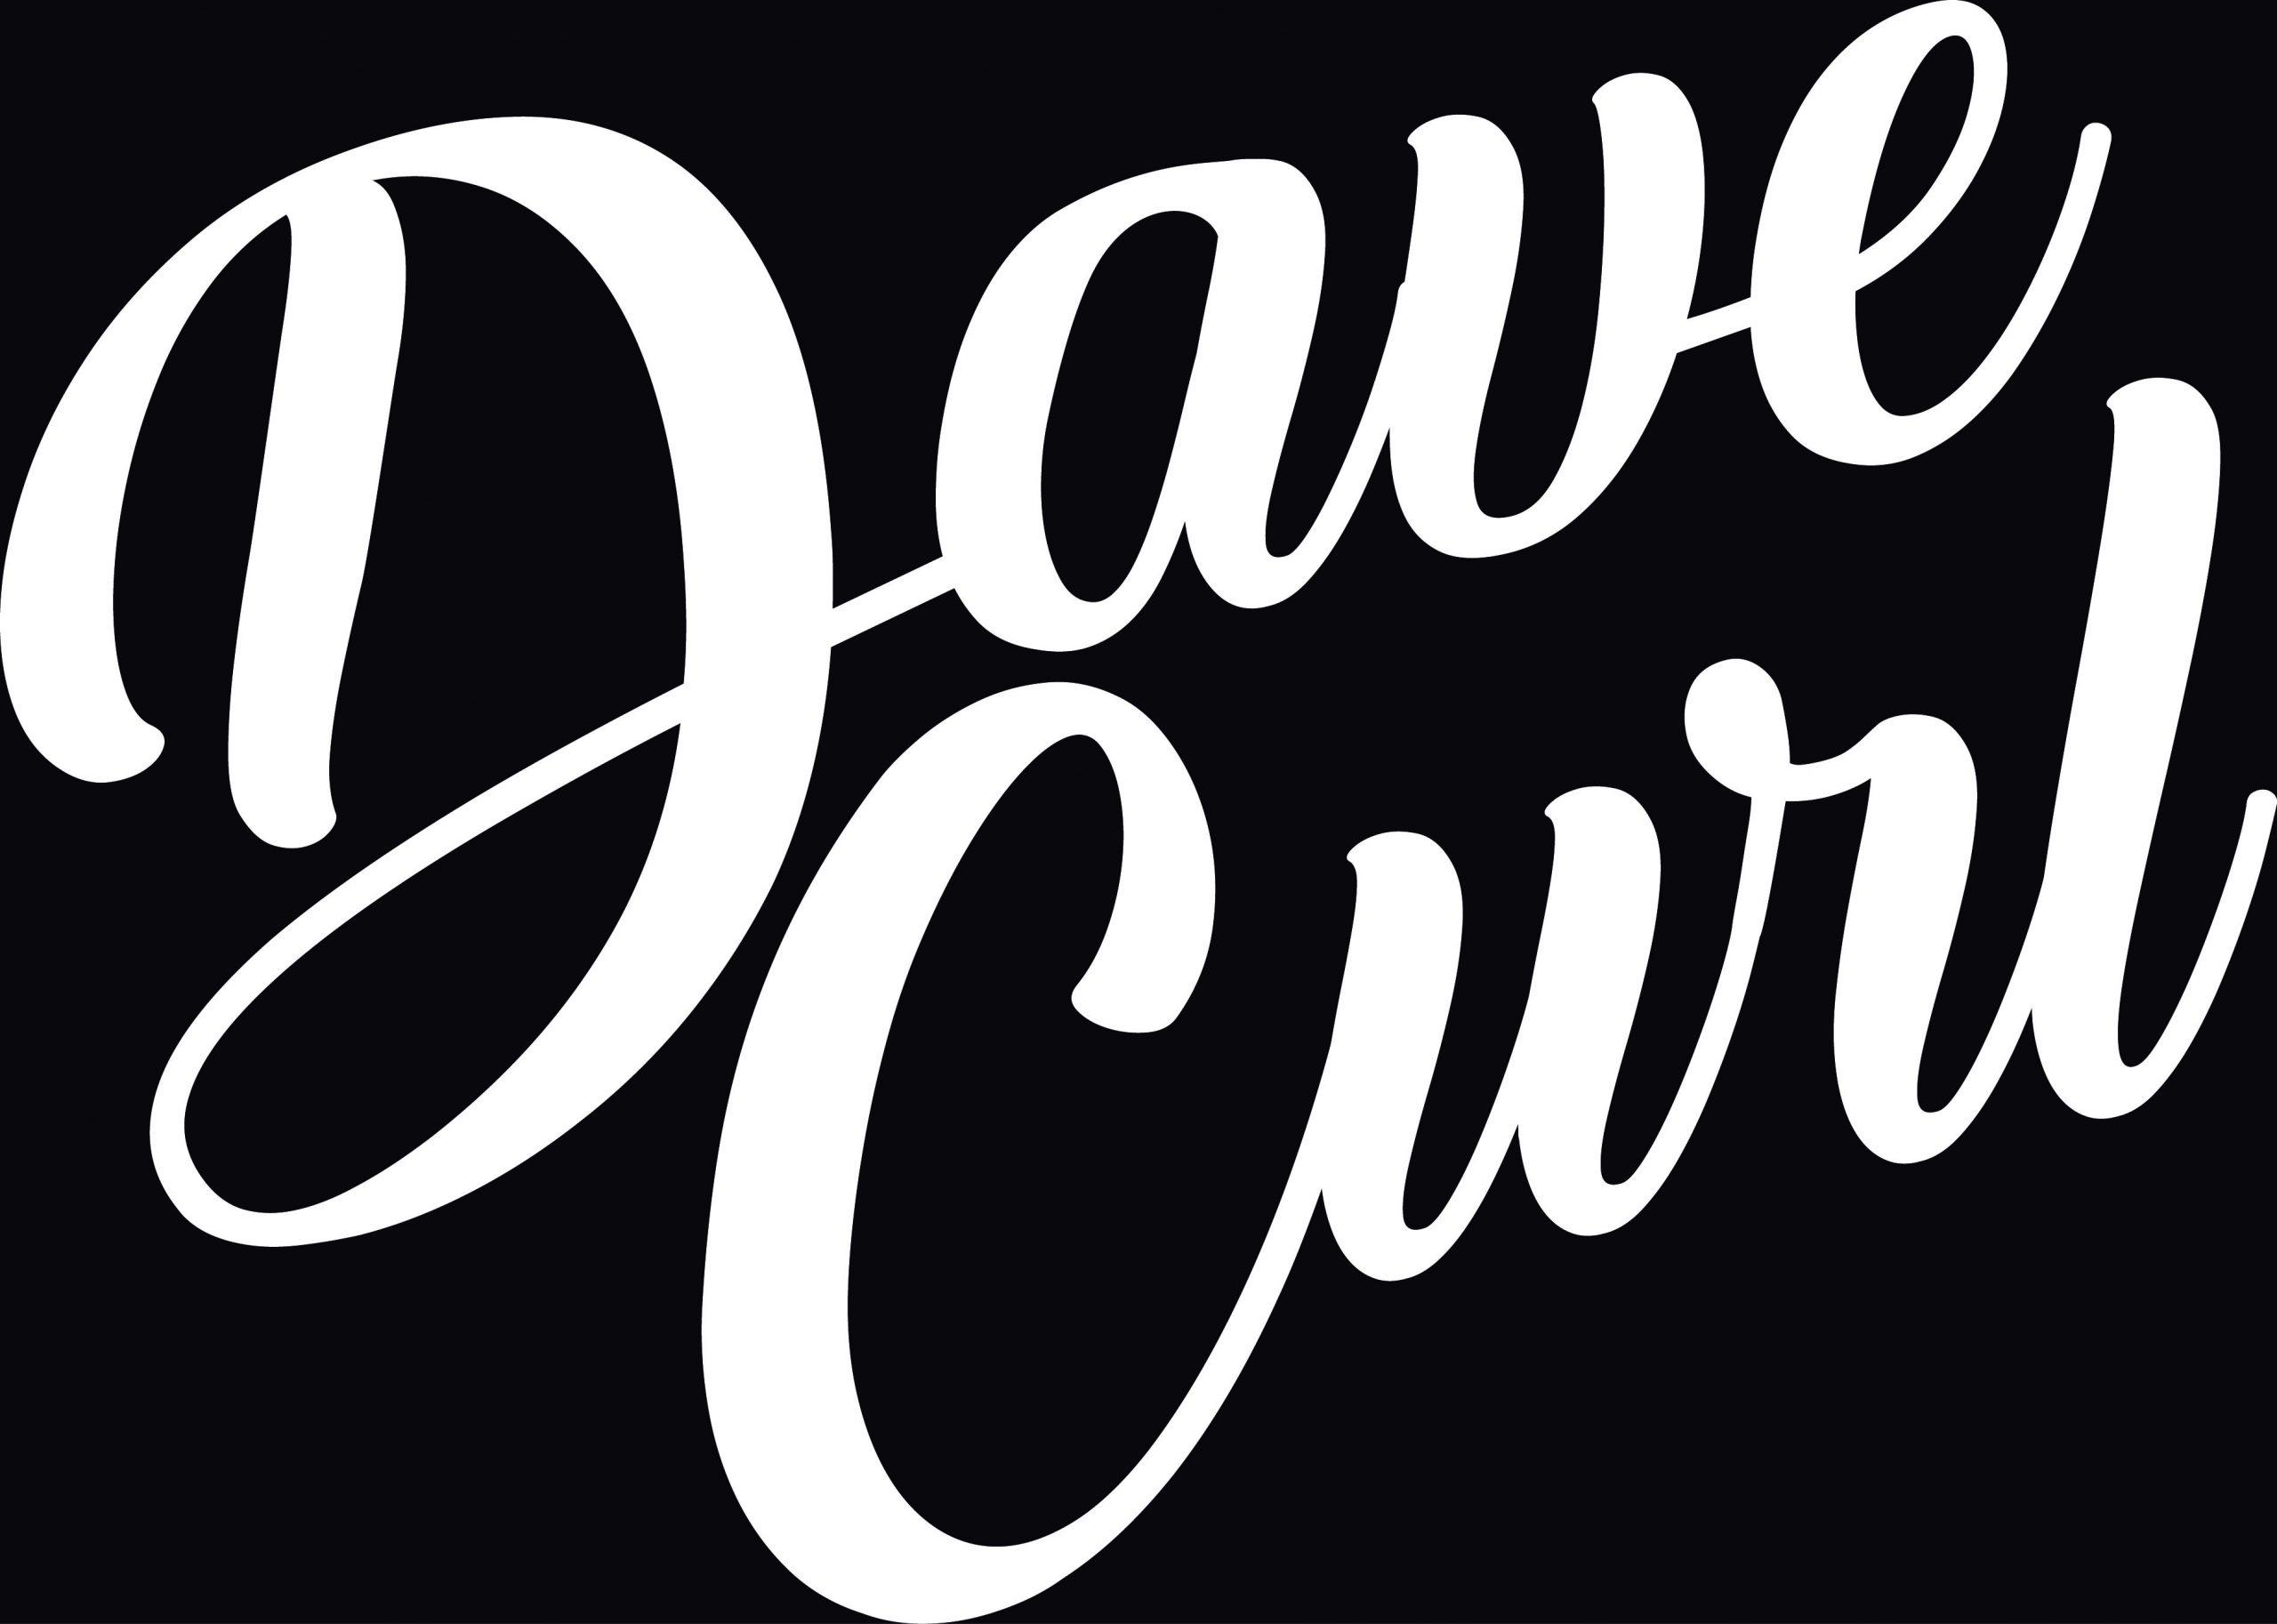 Dave Curl Onlineshop